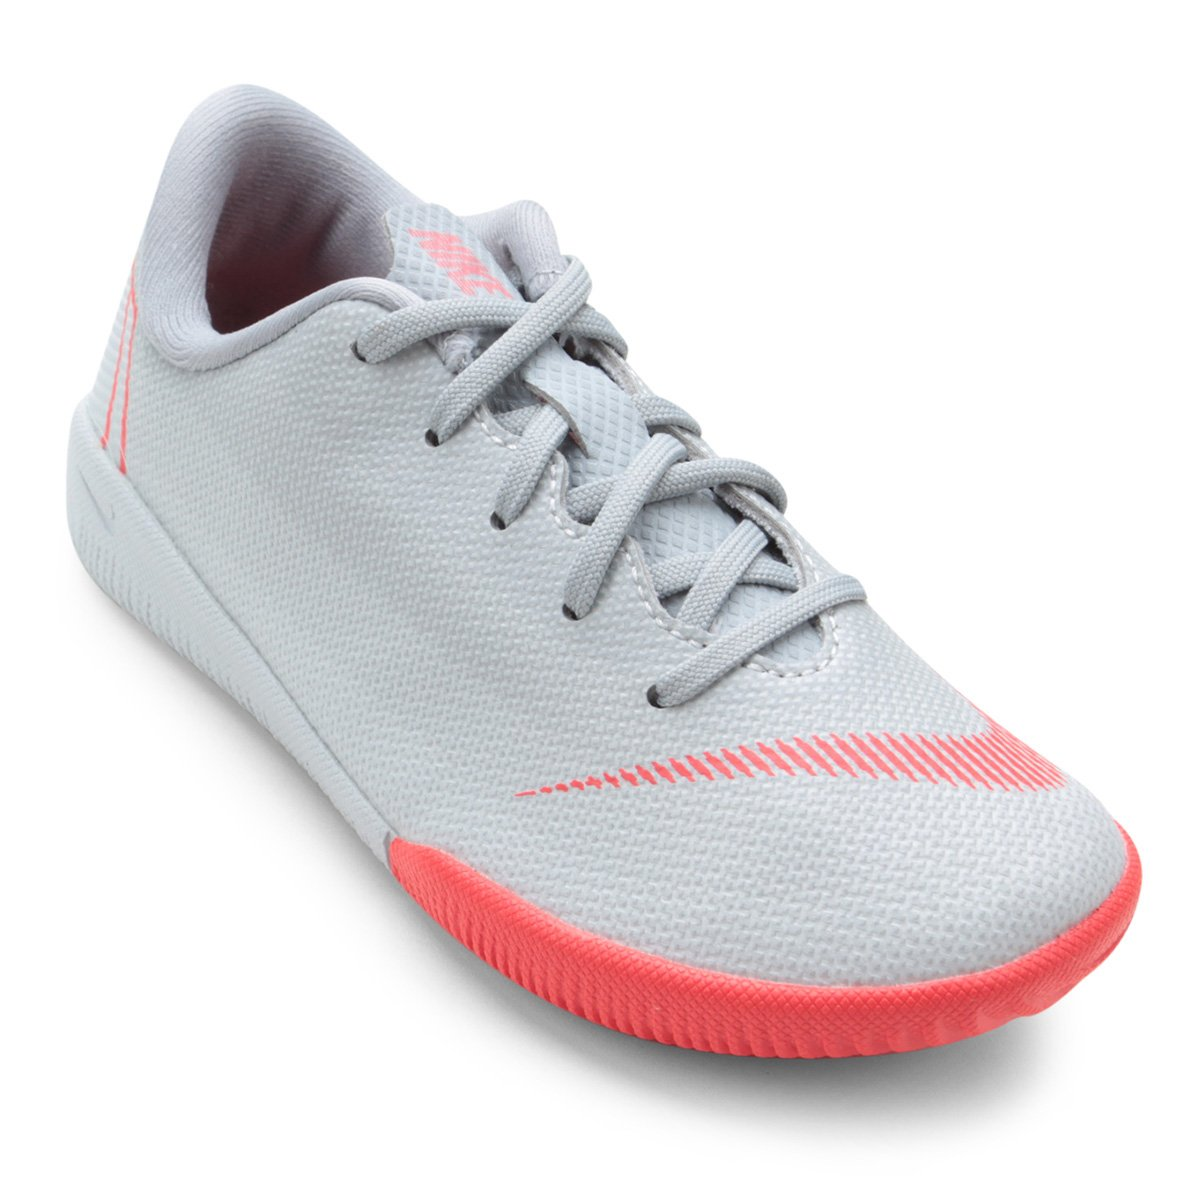 Chuteira Futsal Infantil Nike Mercurial Vapor 12 Academy - Cinza e ... 06de268ecefe1